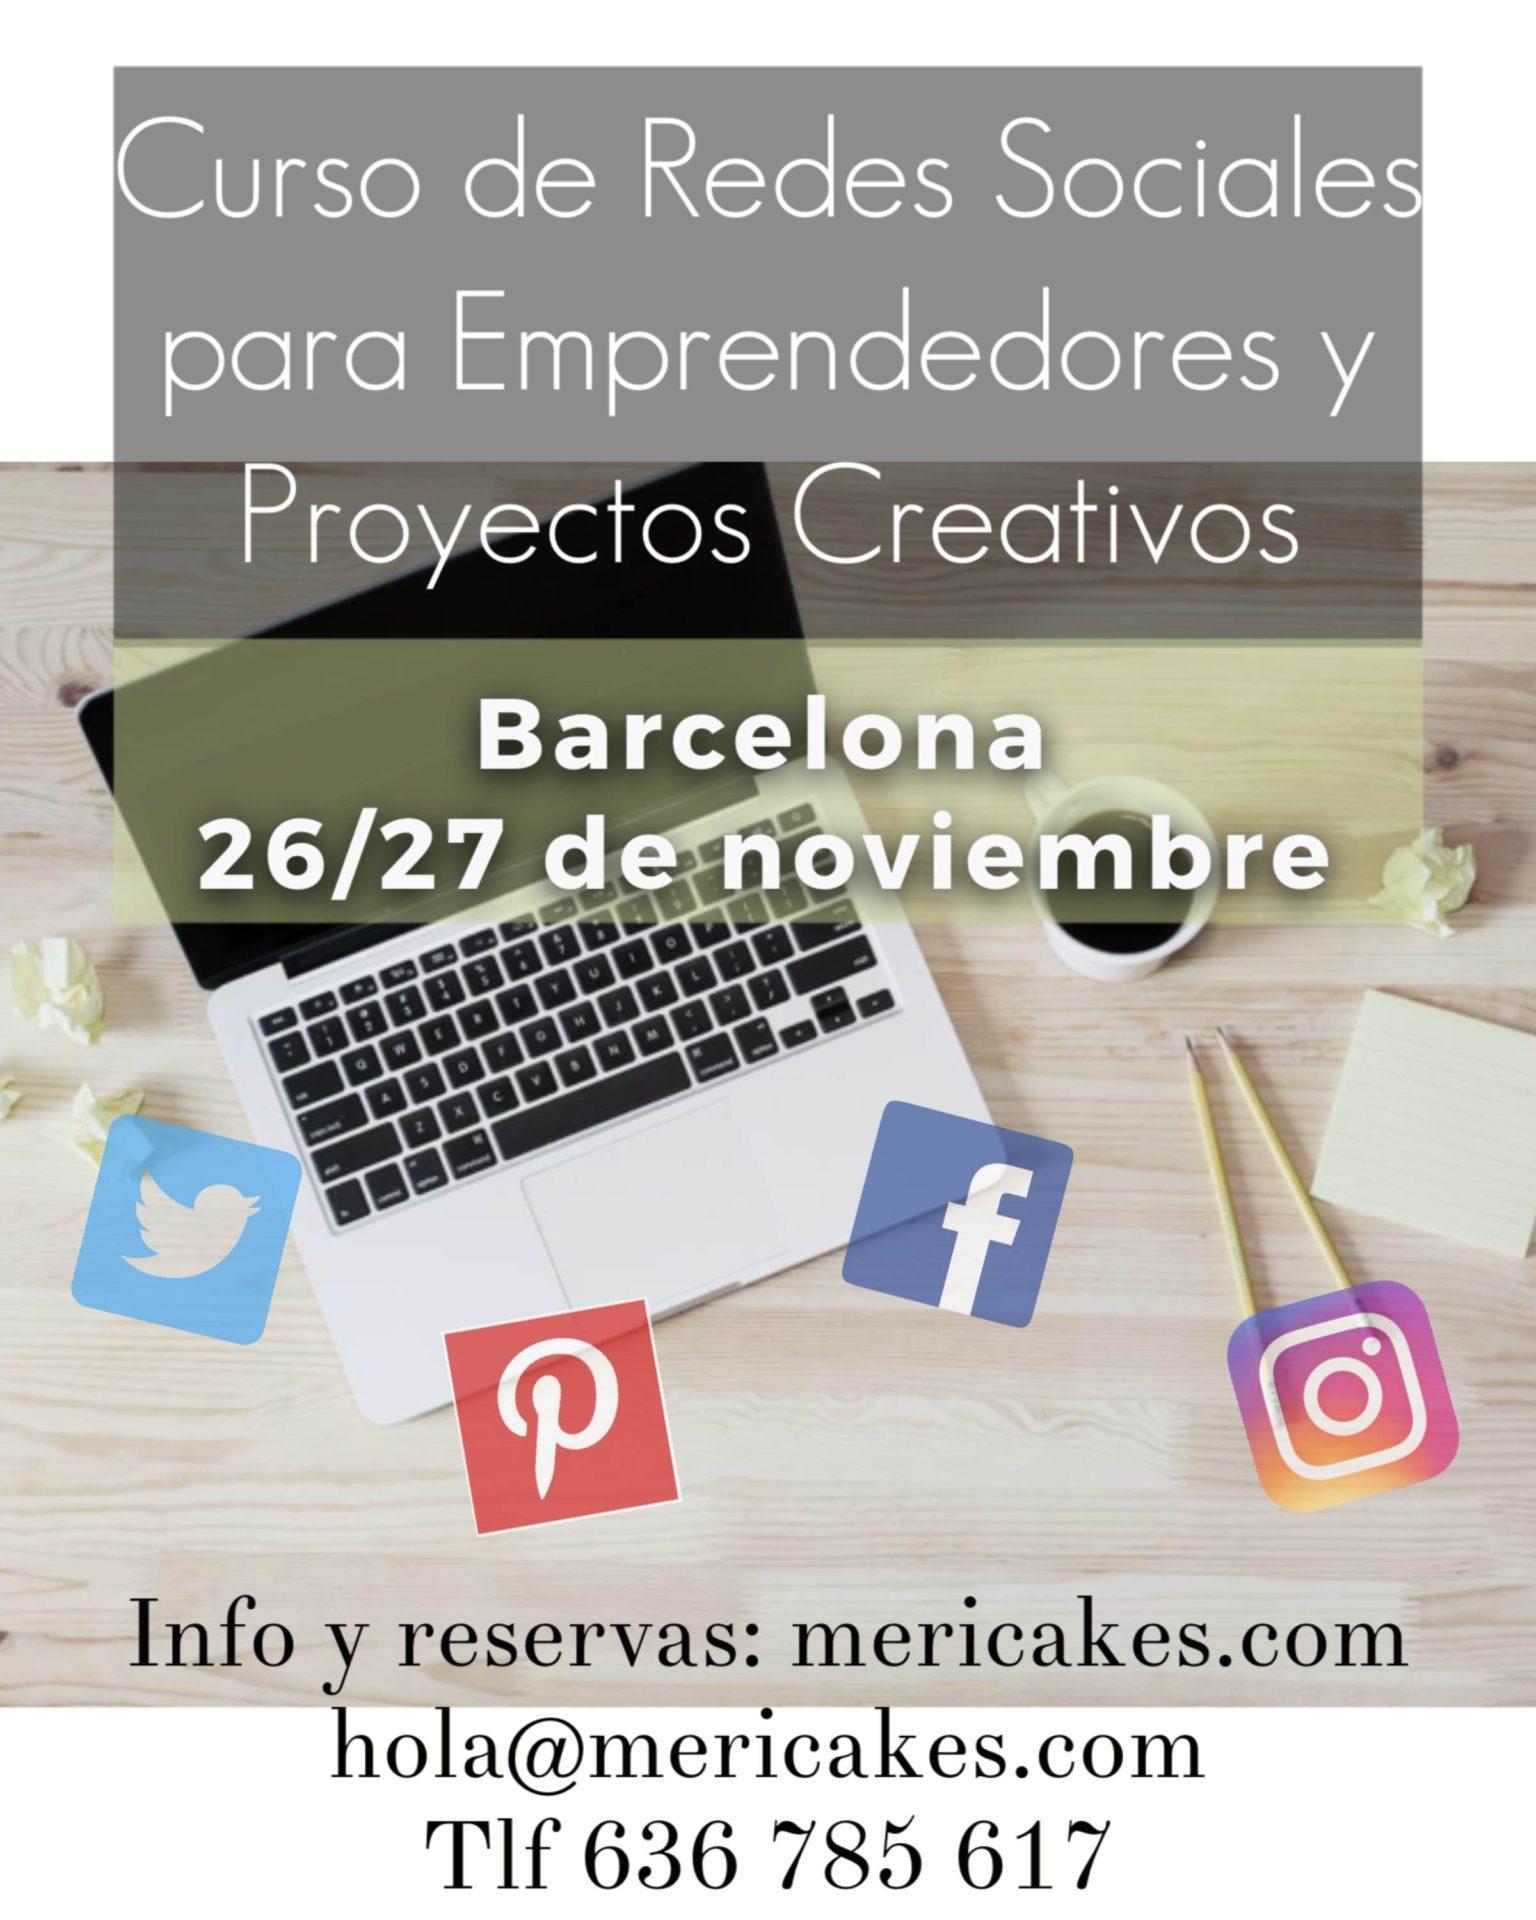 curso-redes-sociales-para-emprendedores-y-proyectos-creativos-comunity-manager-marketing-seo-barcelona-mericakes-taller-autonomos-empresas